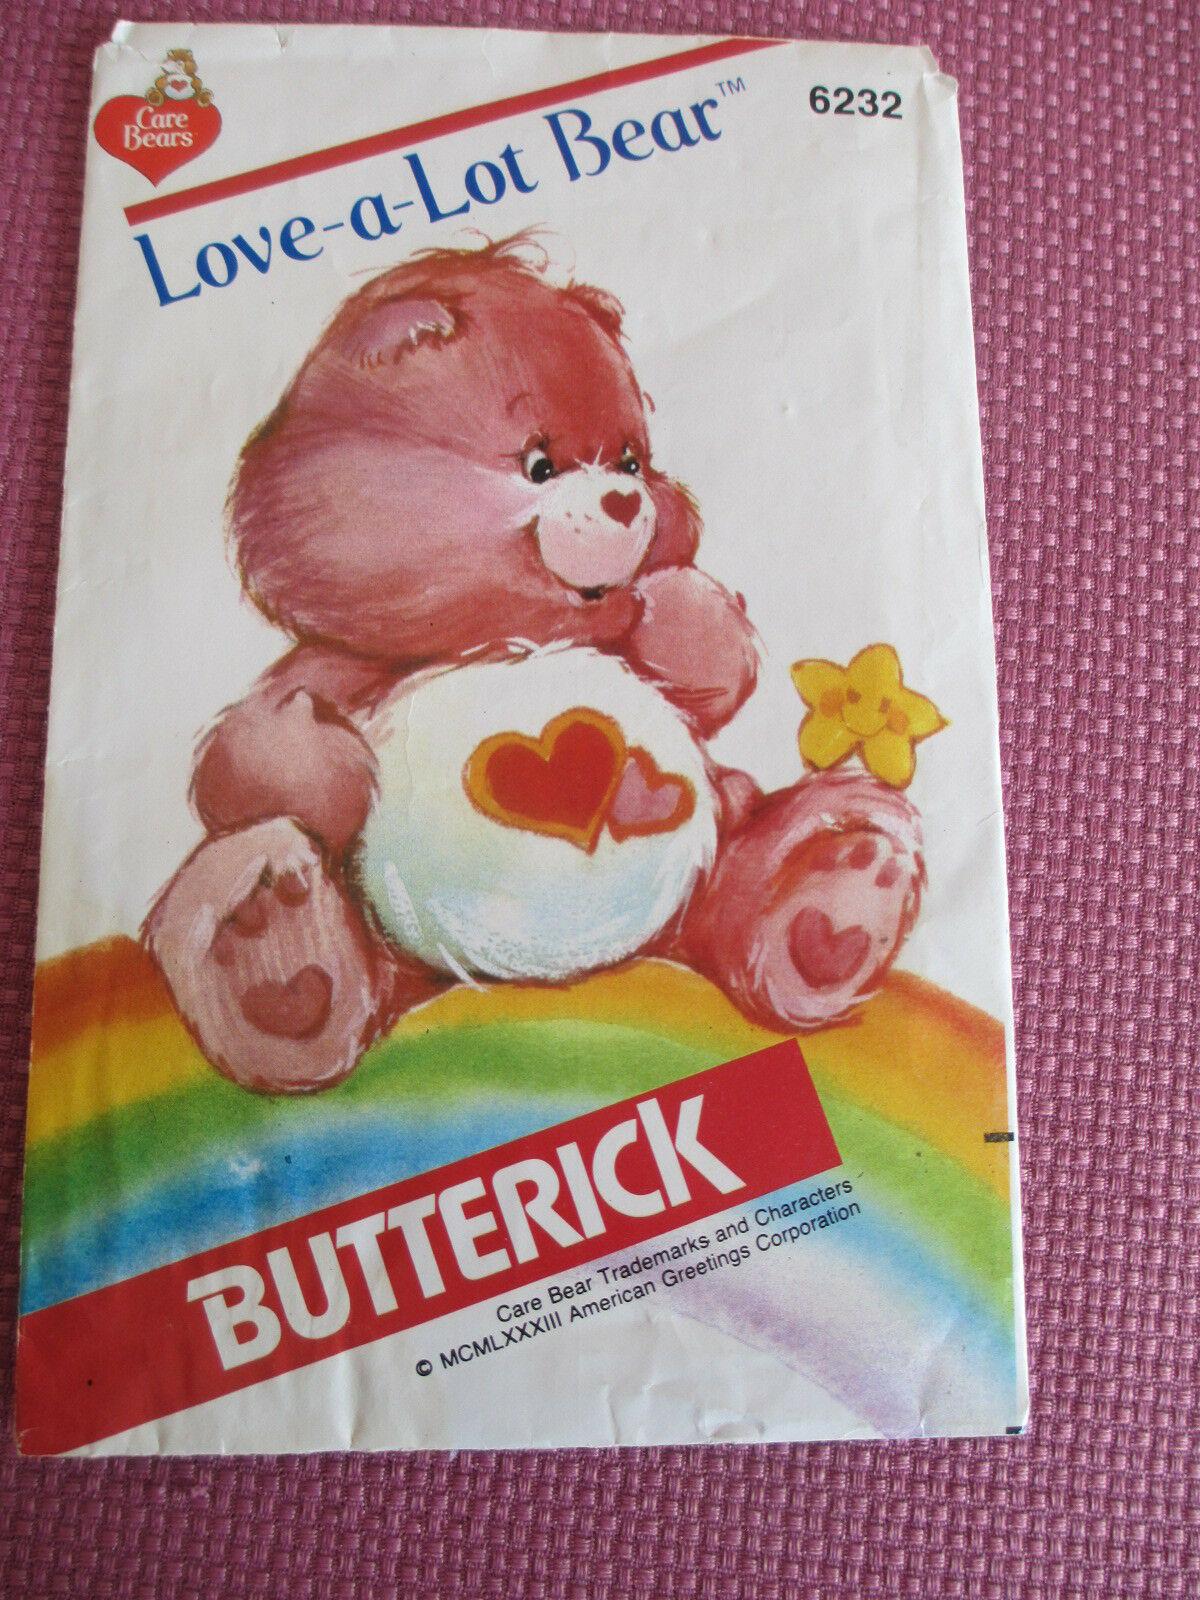 VTG BUTTERICK PATTERN 6232, CARE BEARS LOVE-A-LOT BEAR, 1983, CUT BUT COMPLETE